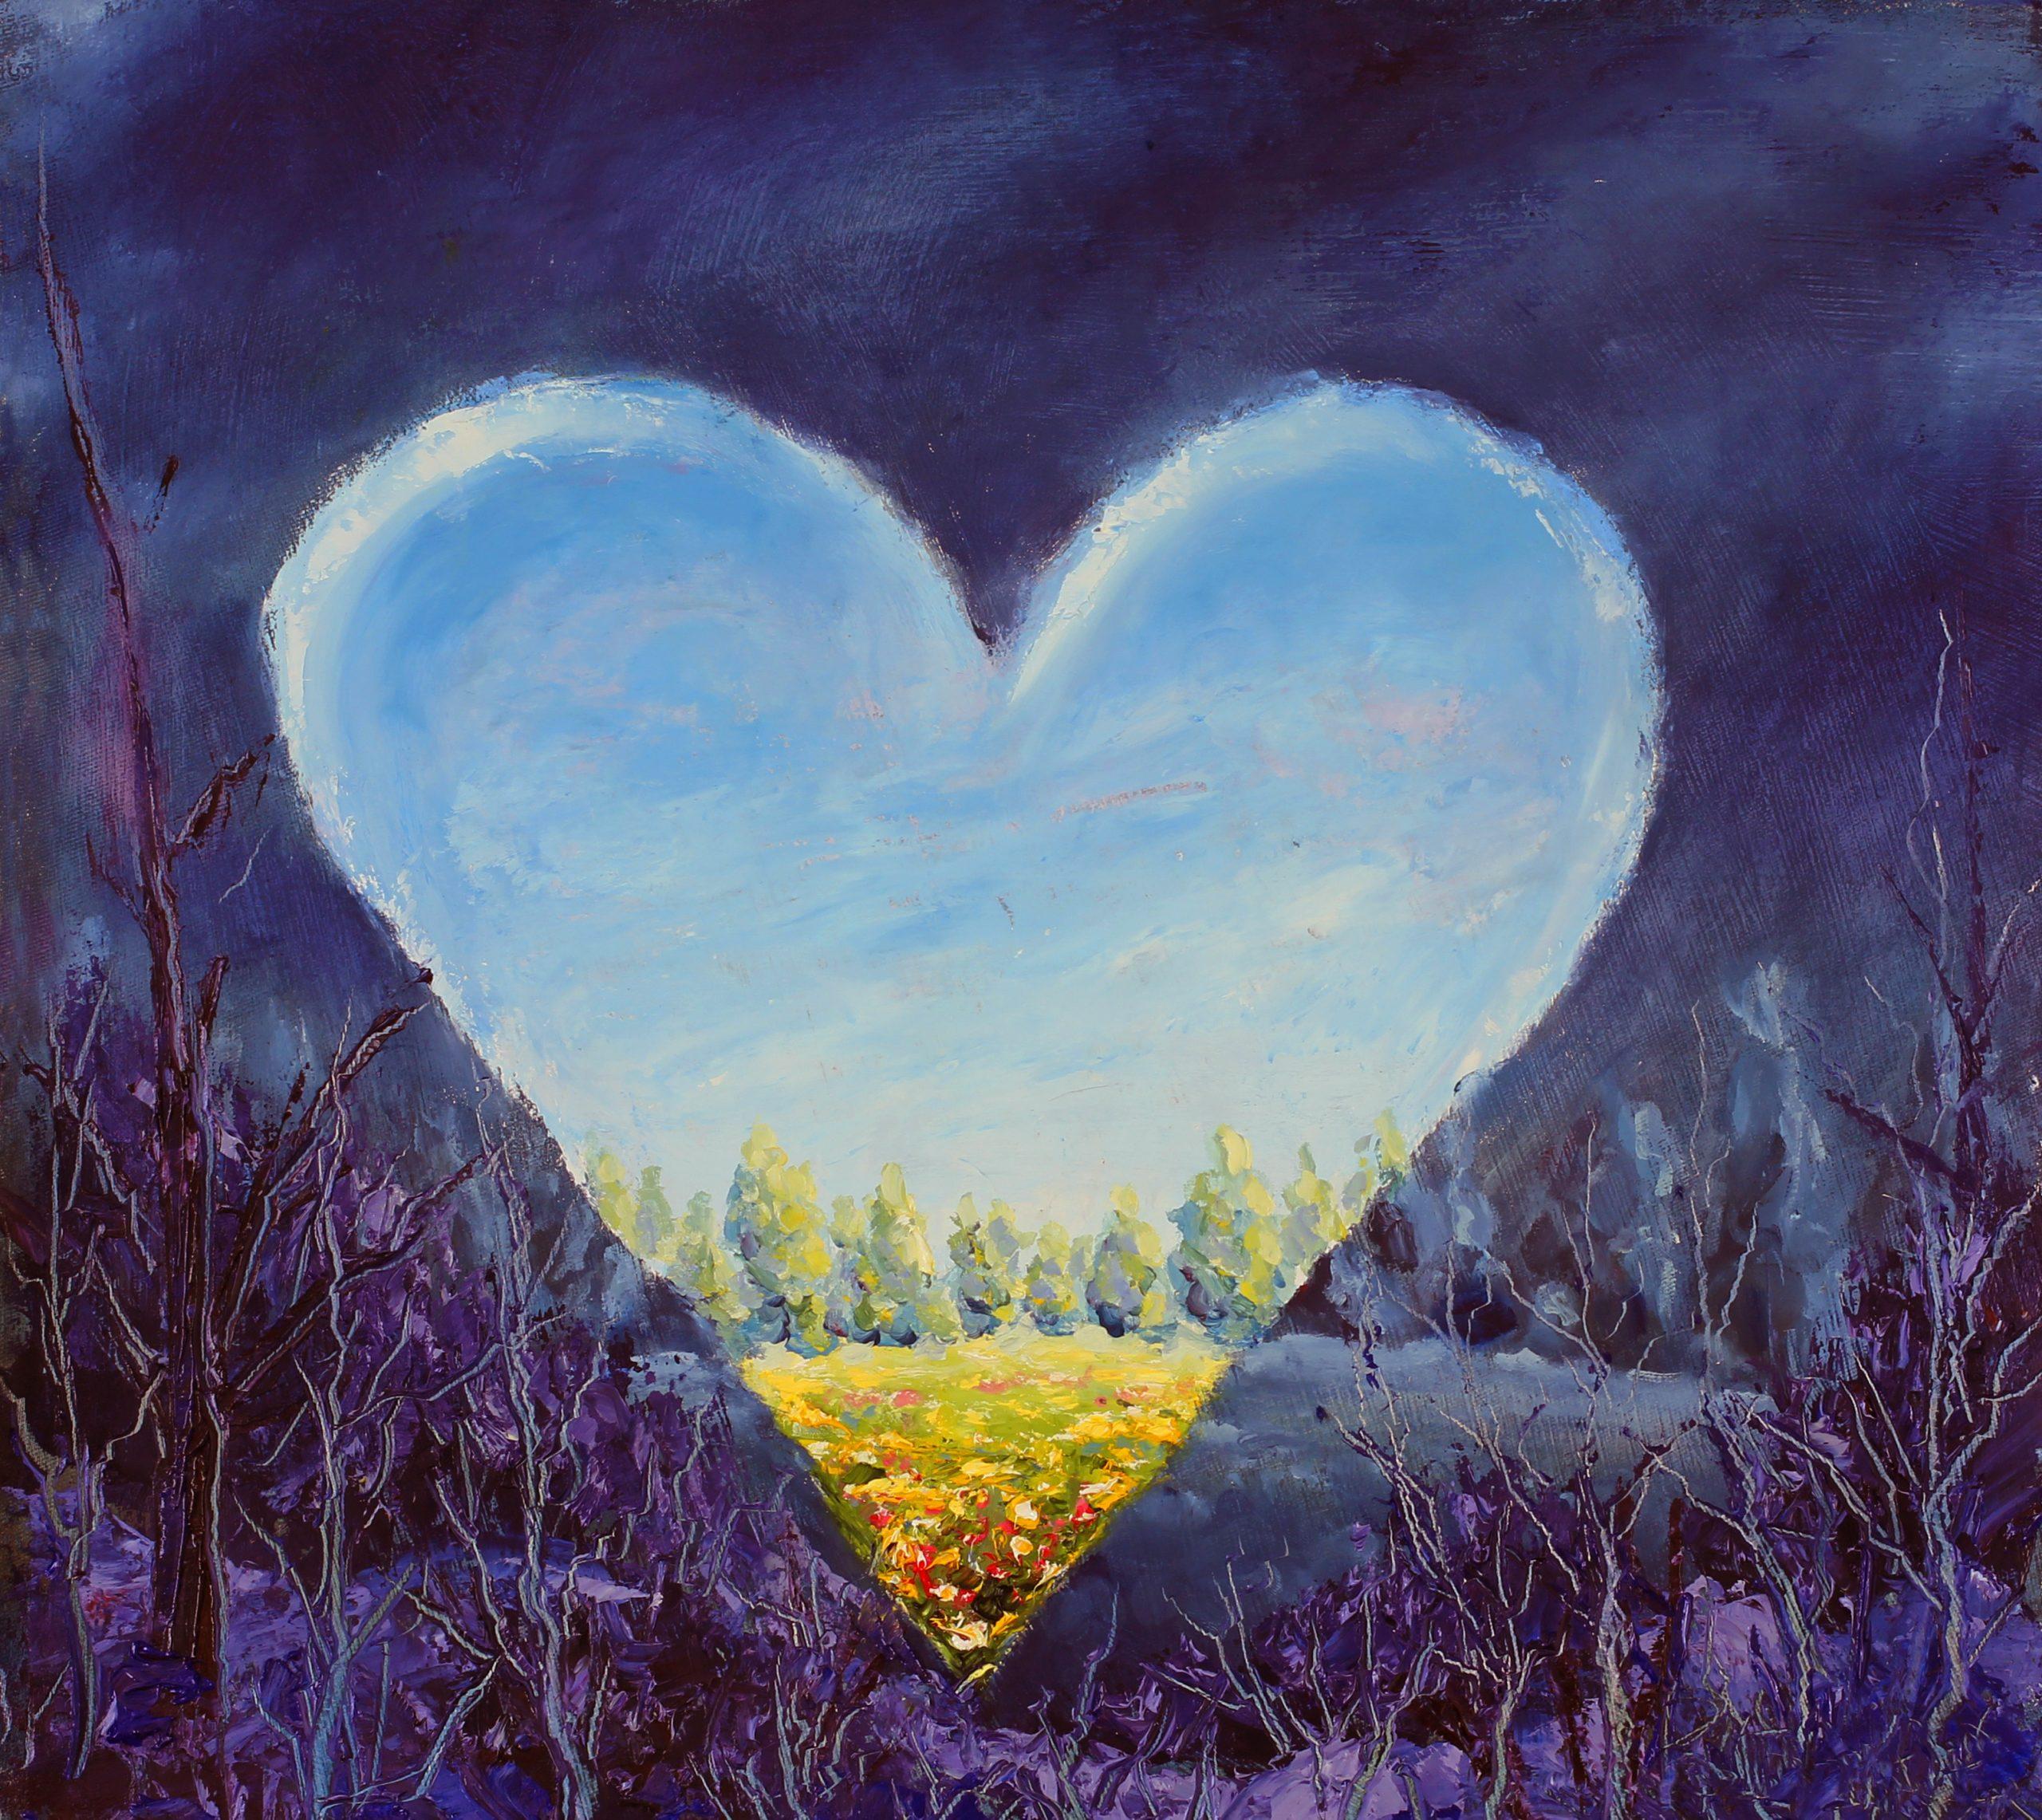 Heart, spring heart on canvas. Open heart. Knife art.